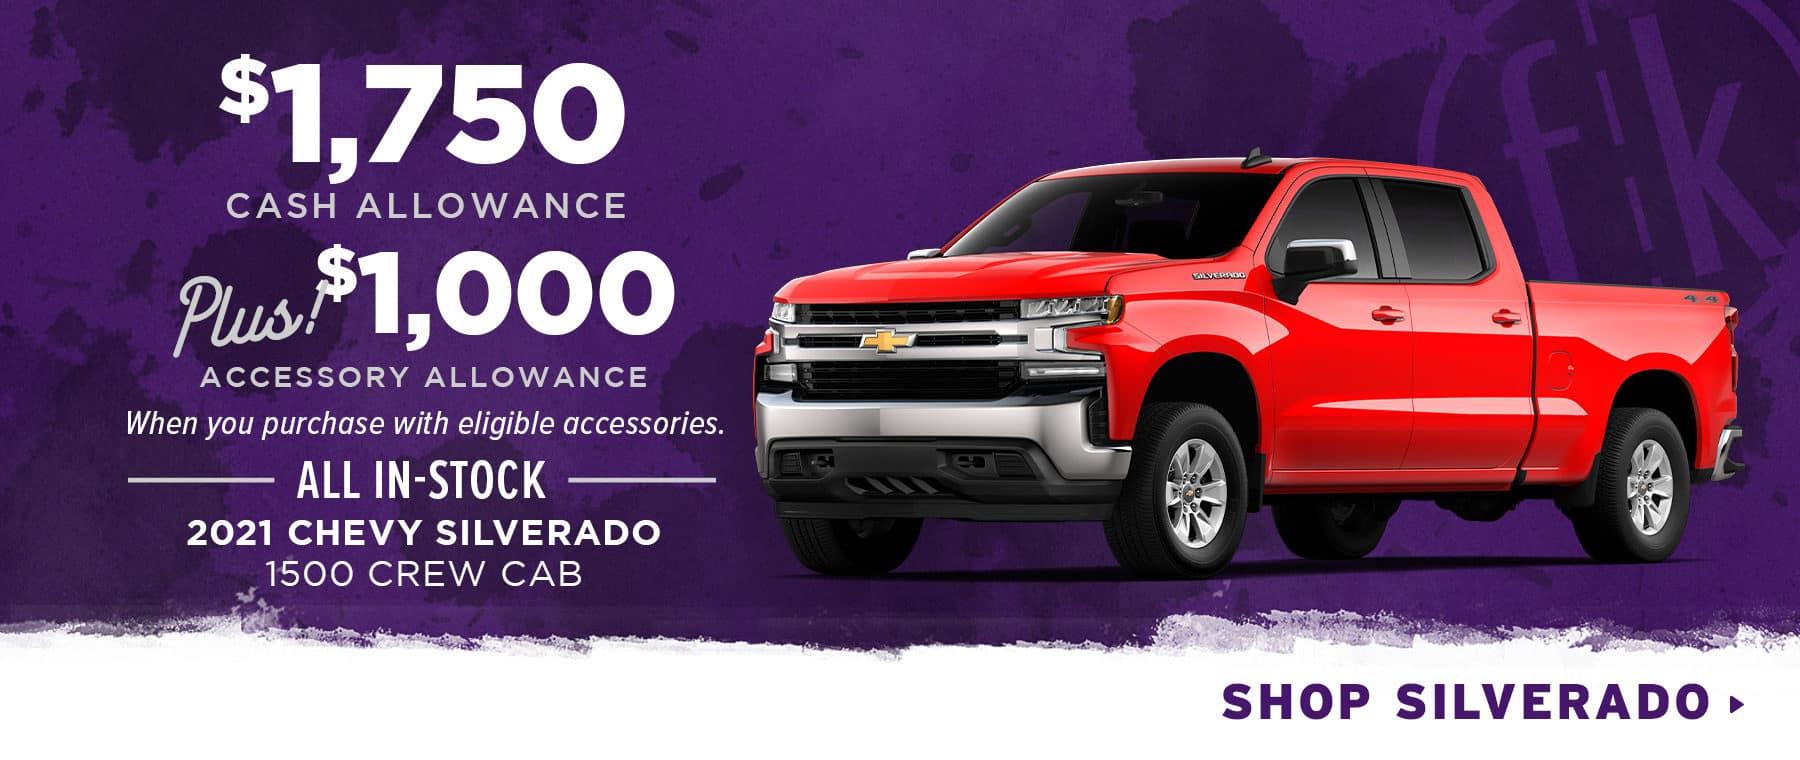 $1,750 Cash Allowance PLUS $1,000 Accessory Allowance All In-Stock 2021 Chevy Silverado 1500 Crew Cab